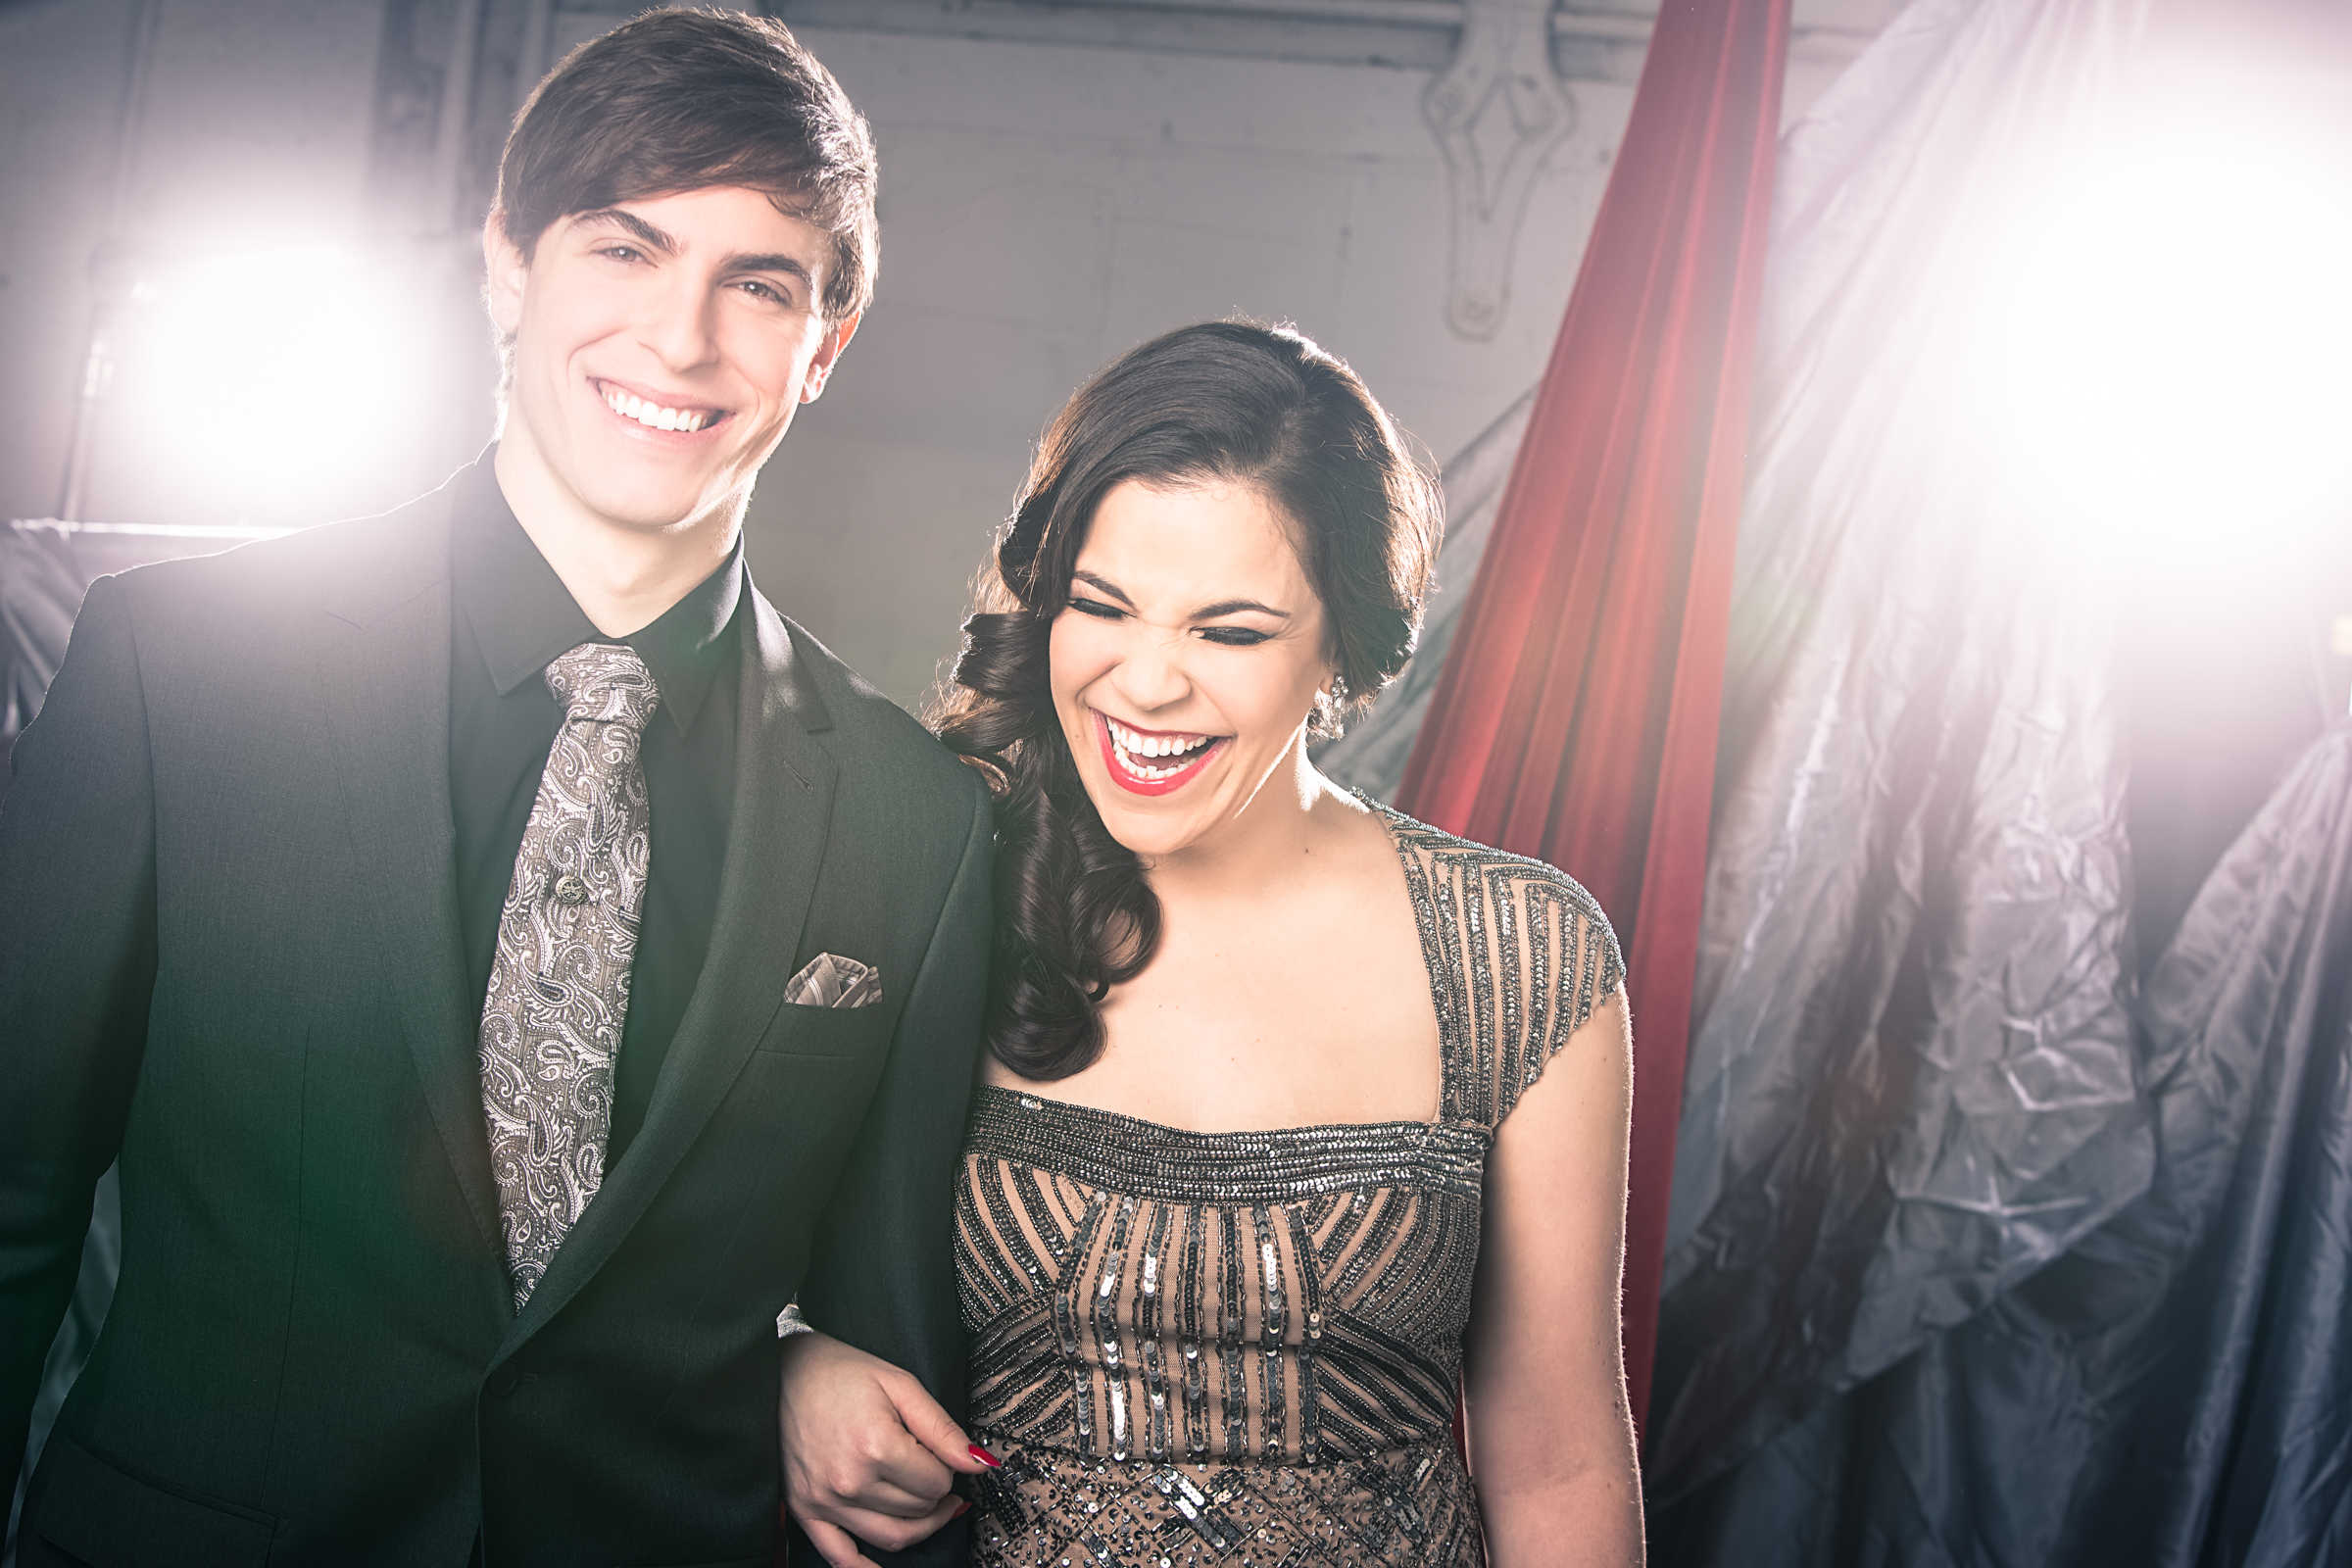 Derek Klena and Lindsay Mendez